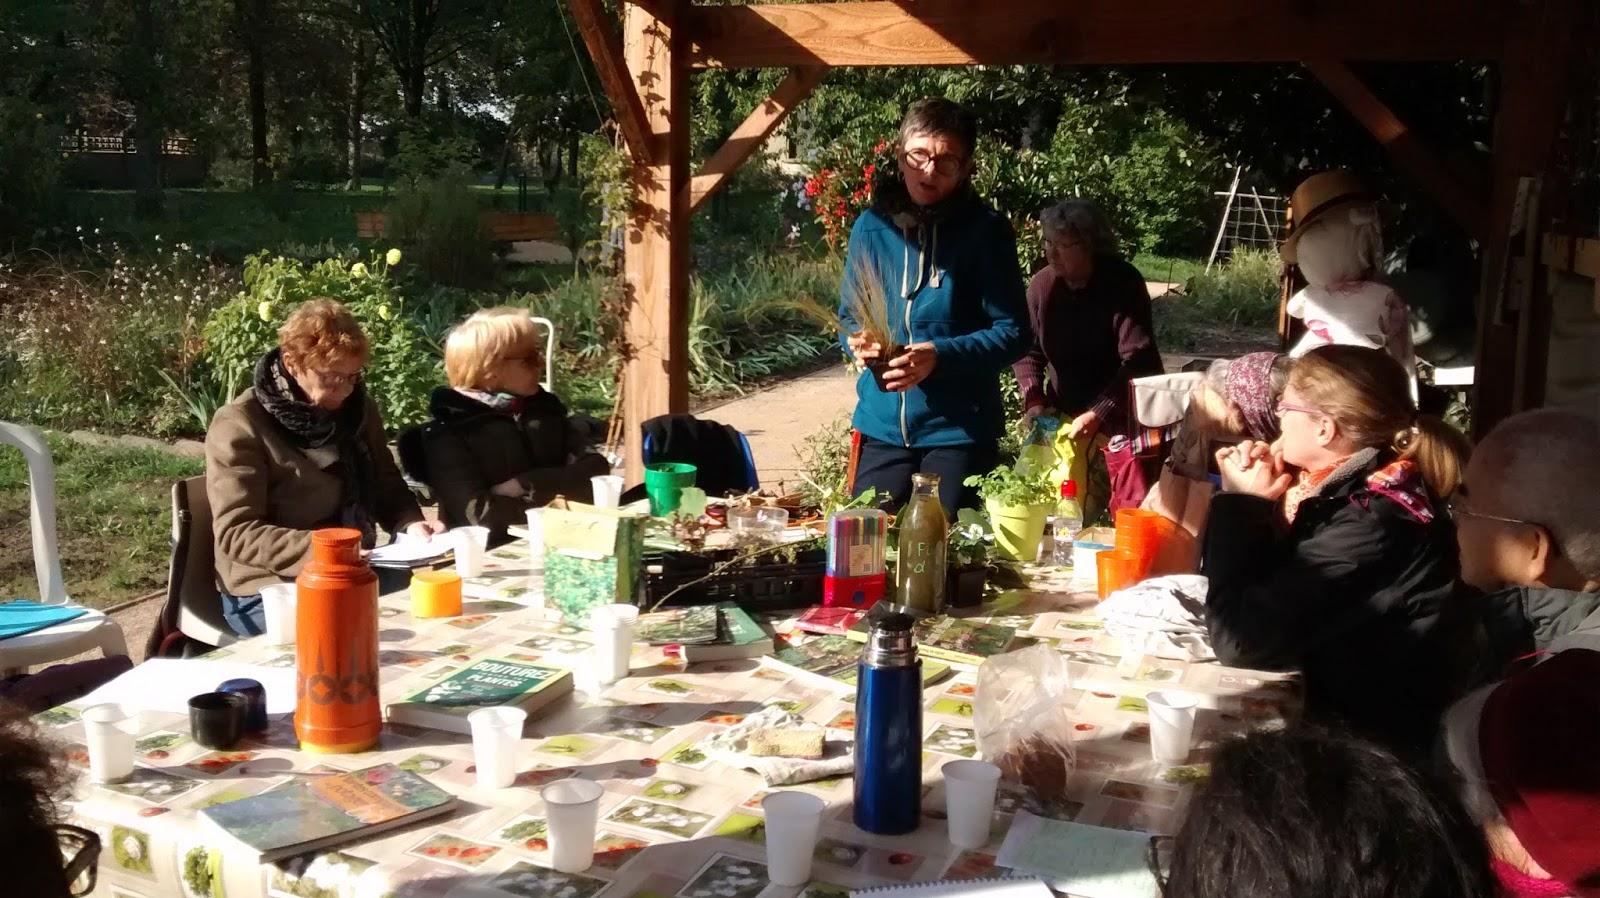 Jardin sur cour octobre 2015 for Jardin octobre 2015